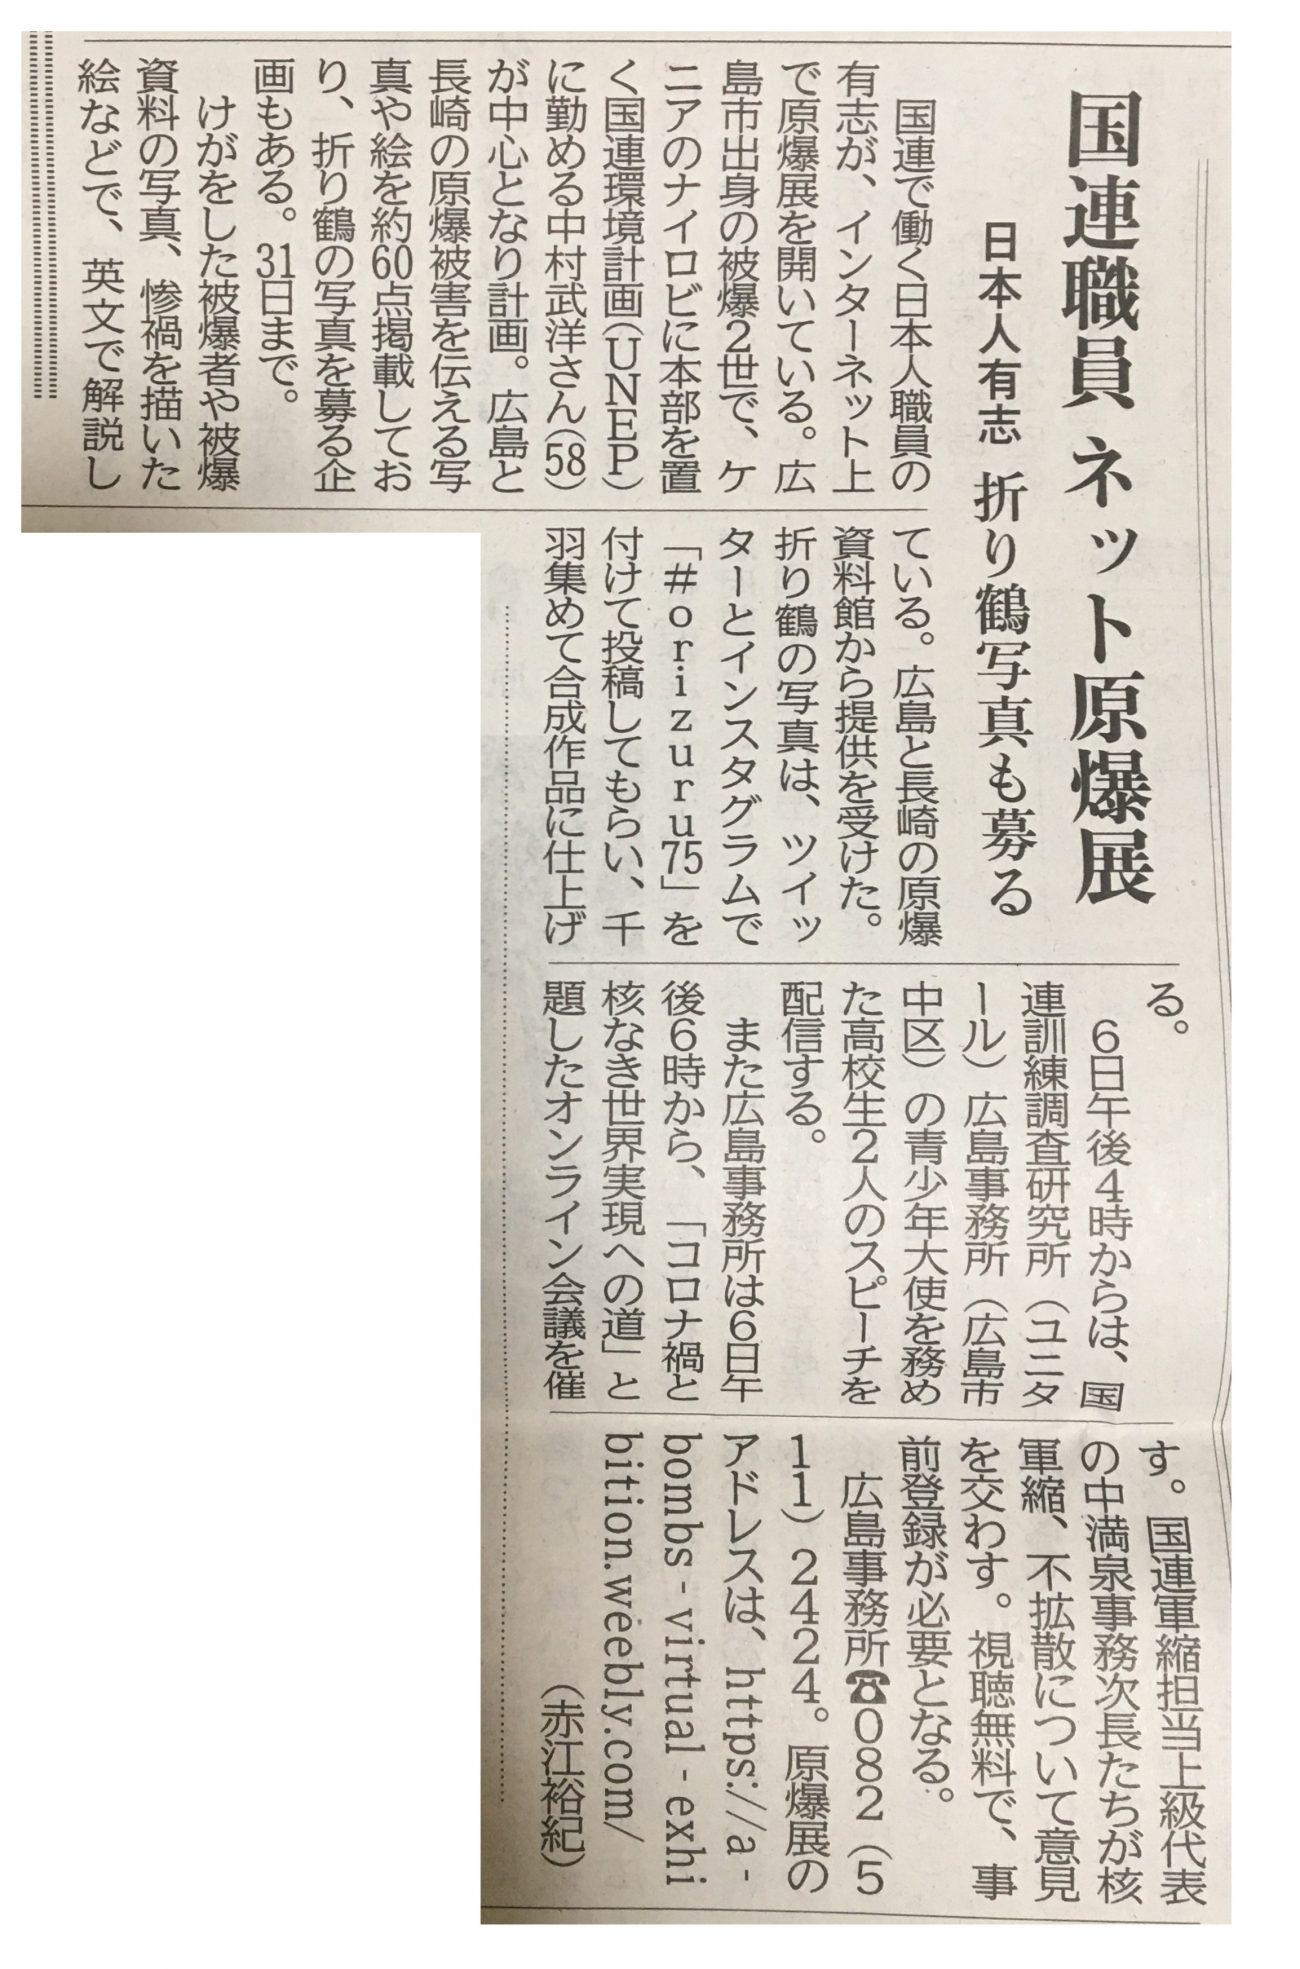 (Media) 国連職員 ネット原爆展 日本人有志